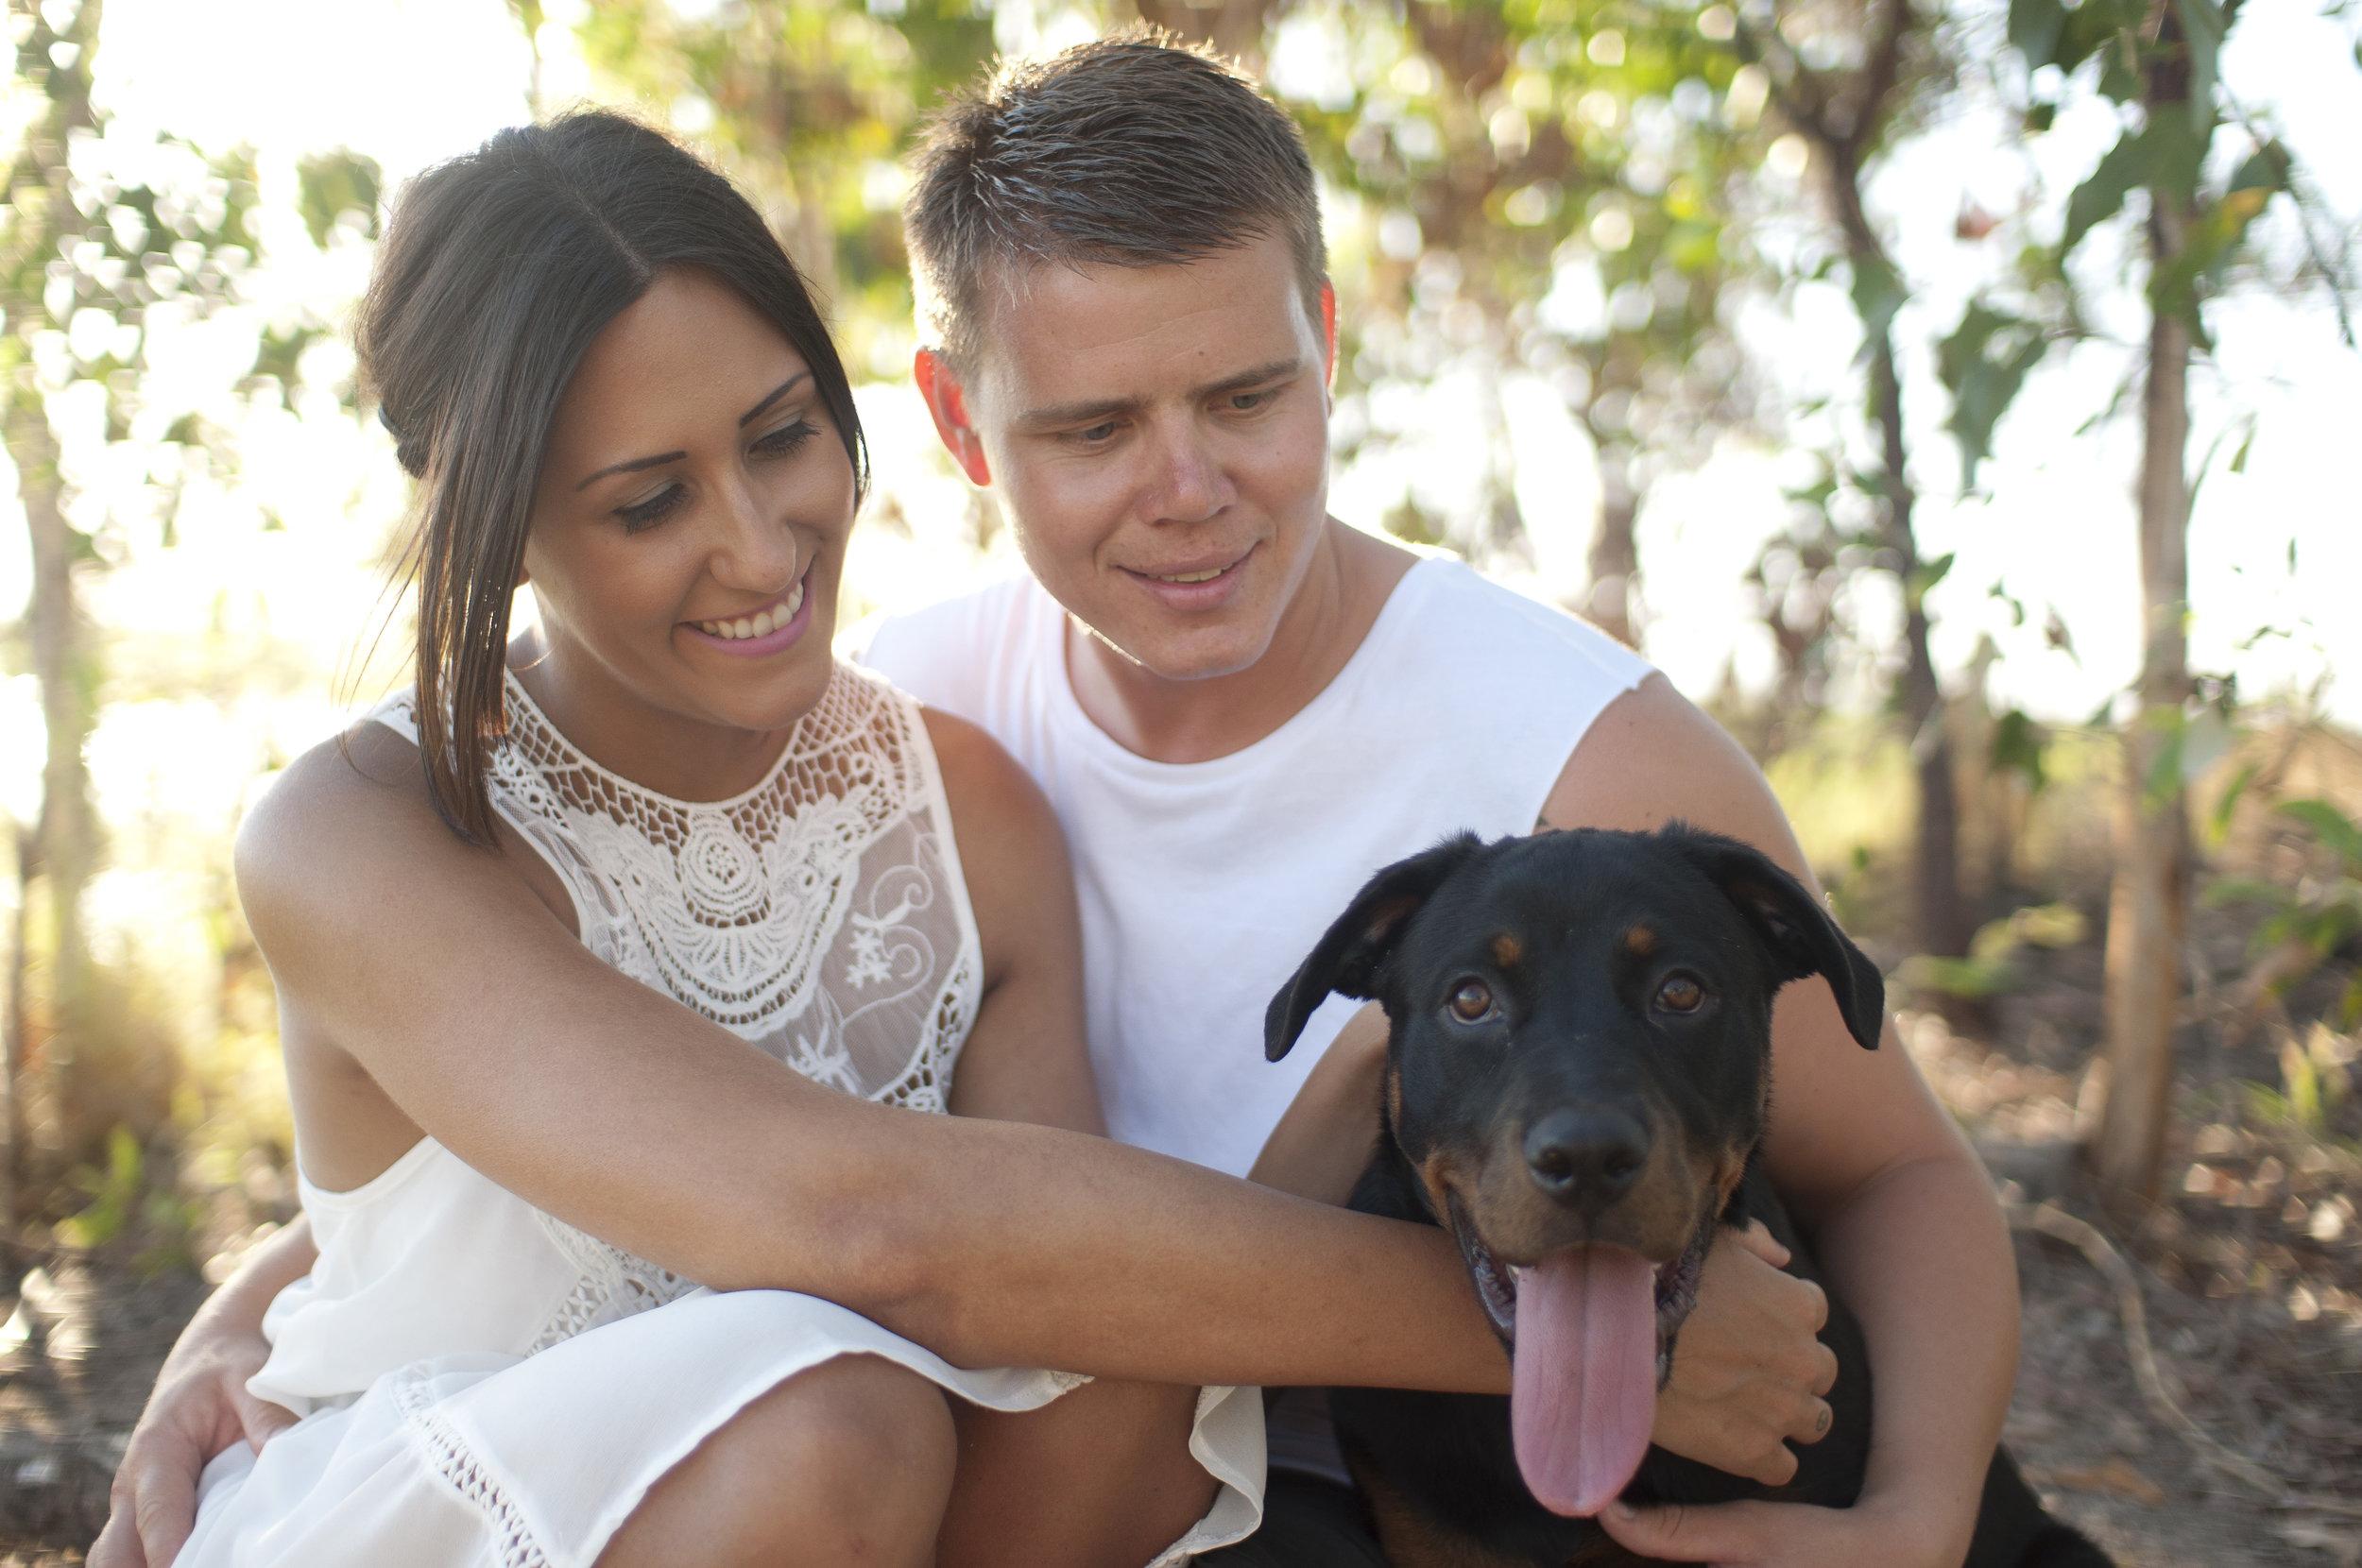 Natali & Jake - Townsville Anniversary     16th November 2014